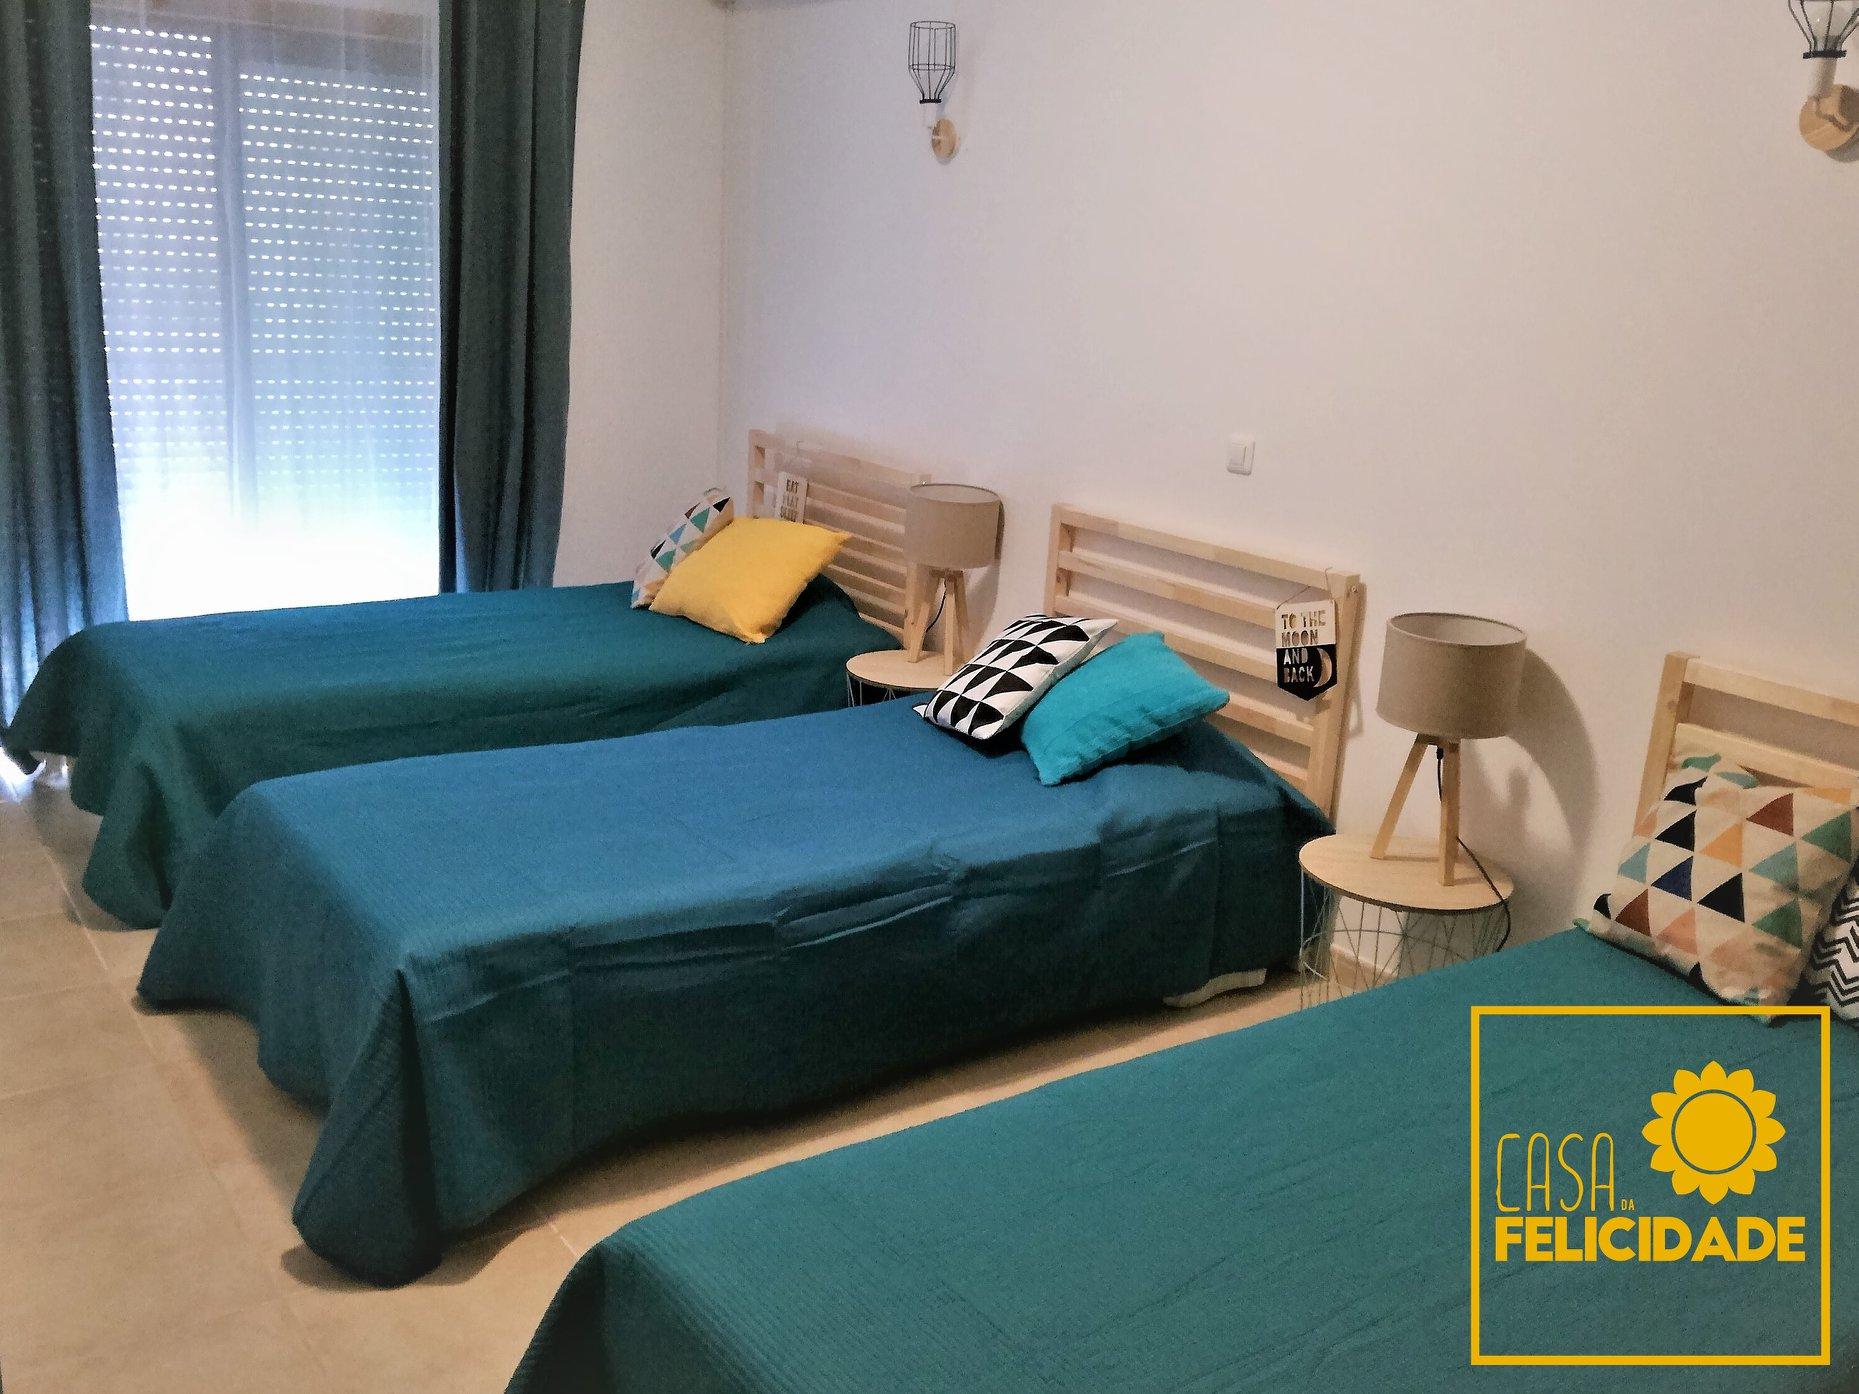 Holiday apartments and villas for rent, Casa da Felicidade – Vacation Rental Apartment in Lagos, Portugal Algarve, REF_IMG_4629_4646